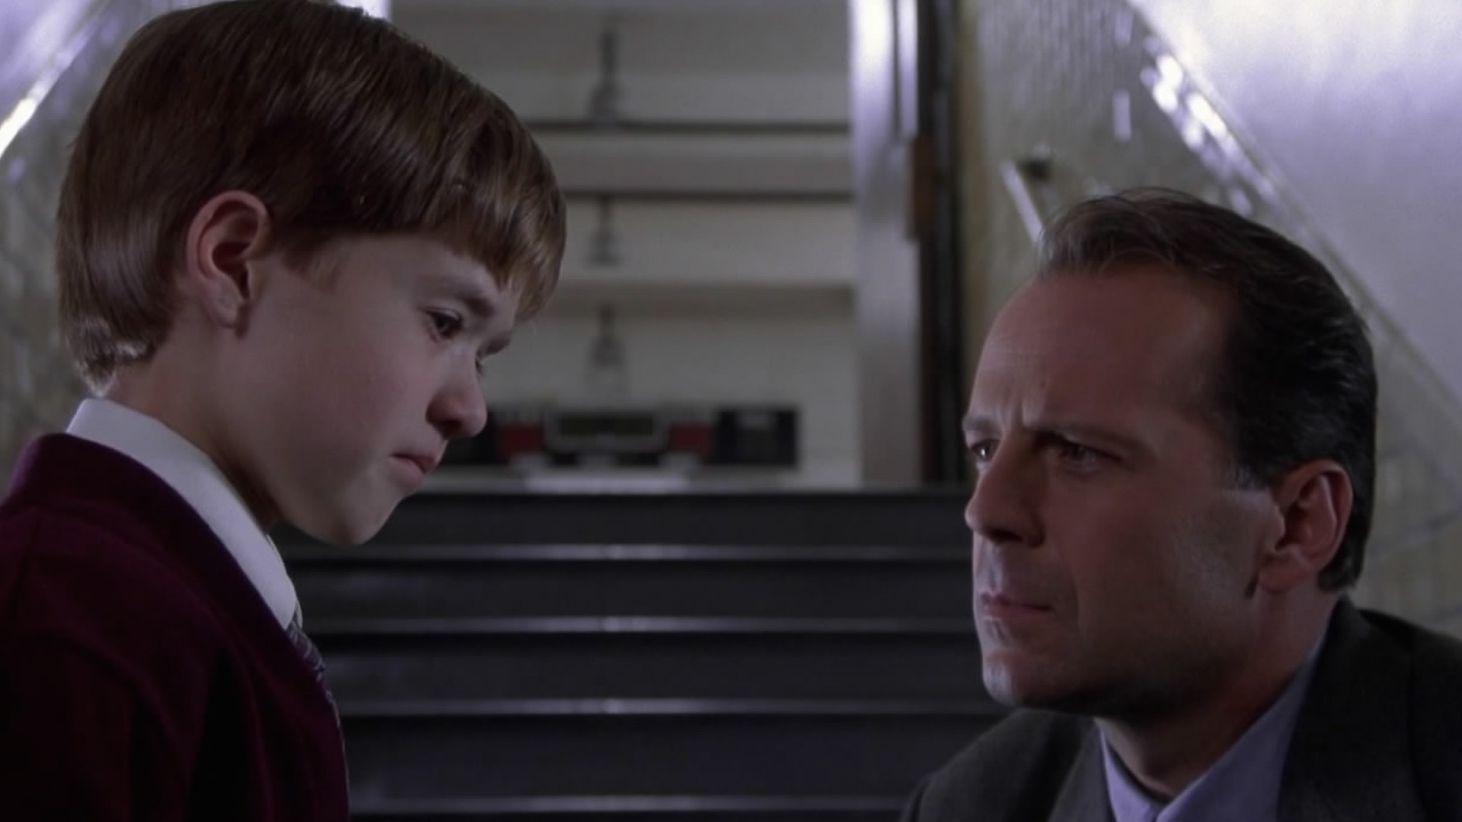 The Sixth Sense Filmklassiker 90er-Jahre